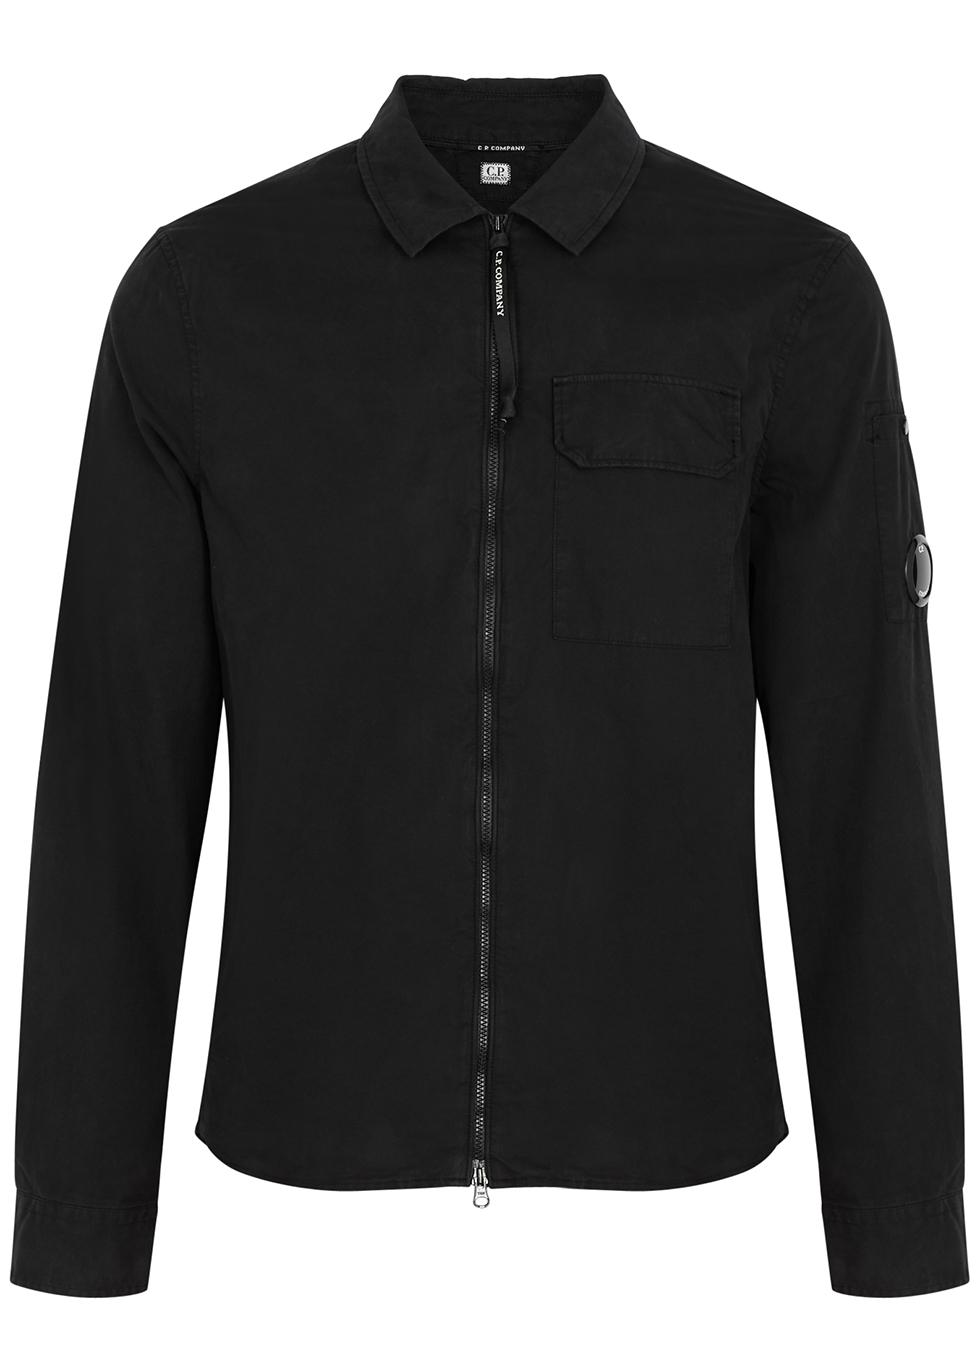 Navy cotton overshirt